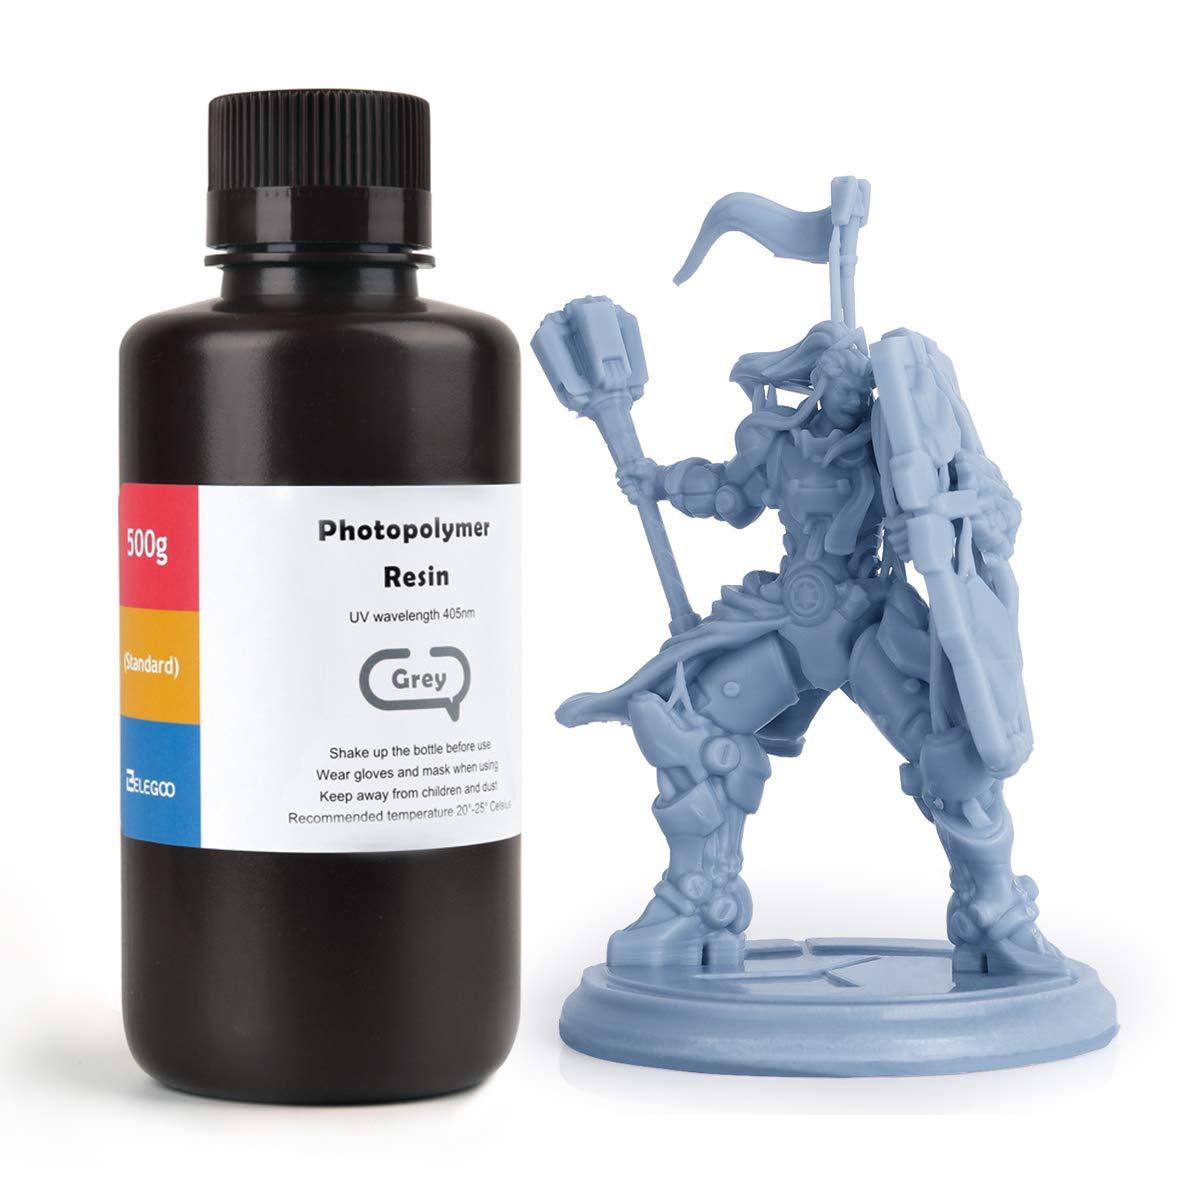 ELEGOO ABS-Like 3D Rapid Resin LCD UV-Curing Resin 405nm Standard Photopolymer Resin for LCD 3D Printing Grey 500g